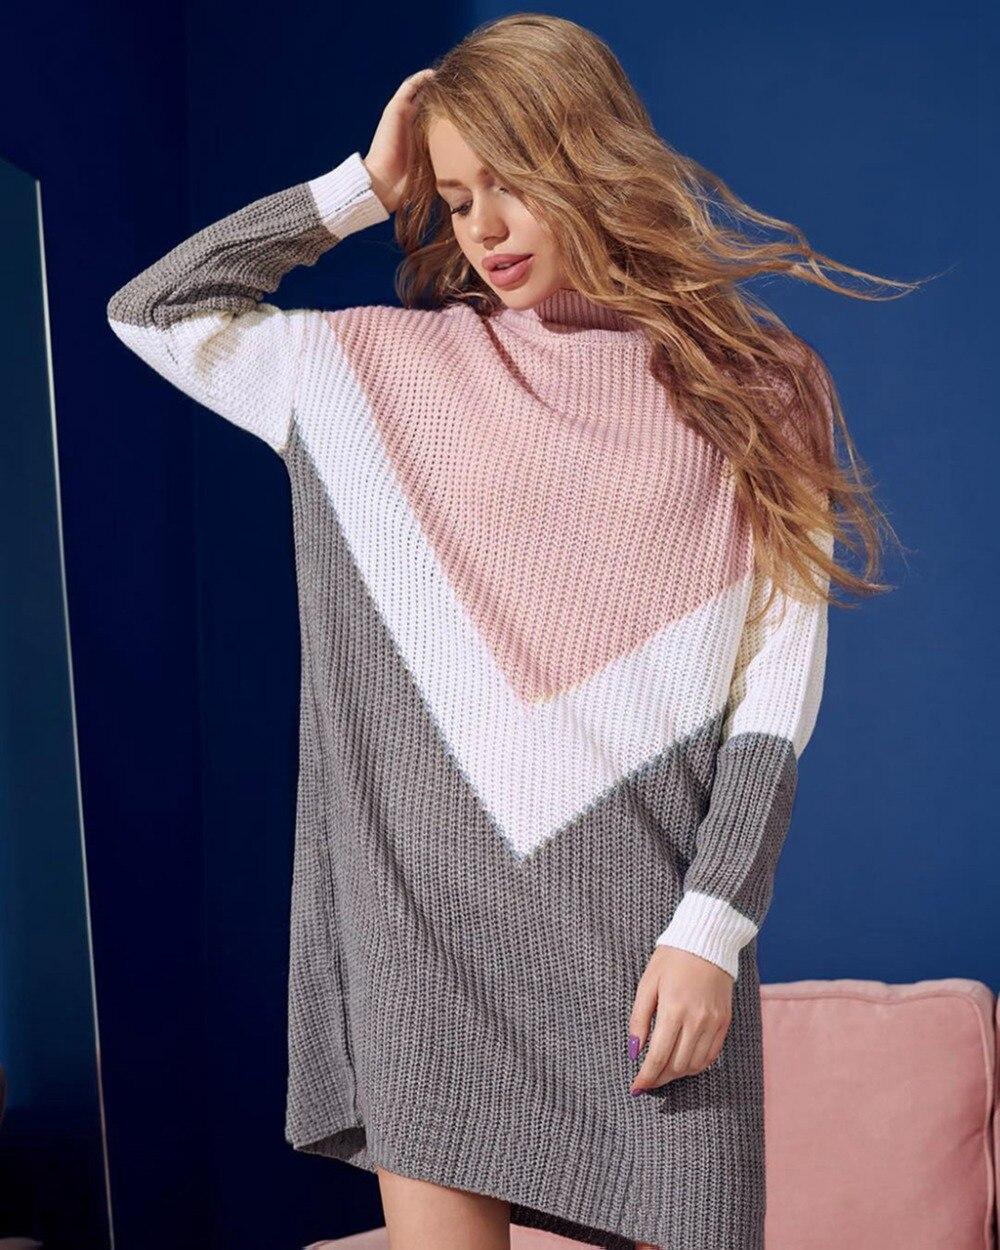 Women Winter Sweater Geometric Pattern Sweaters Patchwork Block Style Casual Jumpers Warm Fashion Office Long Sleeve O-neck